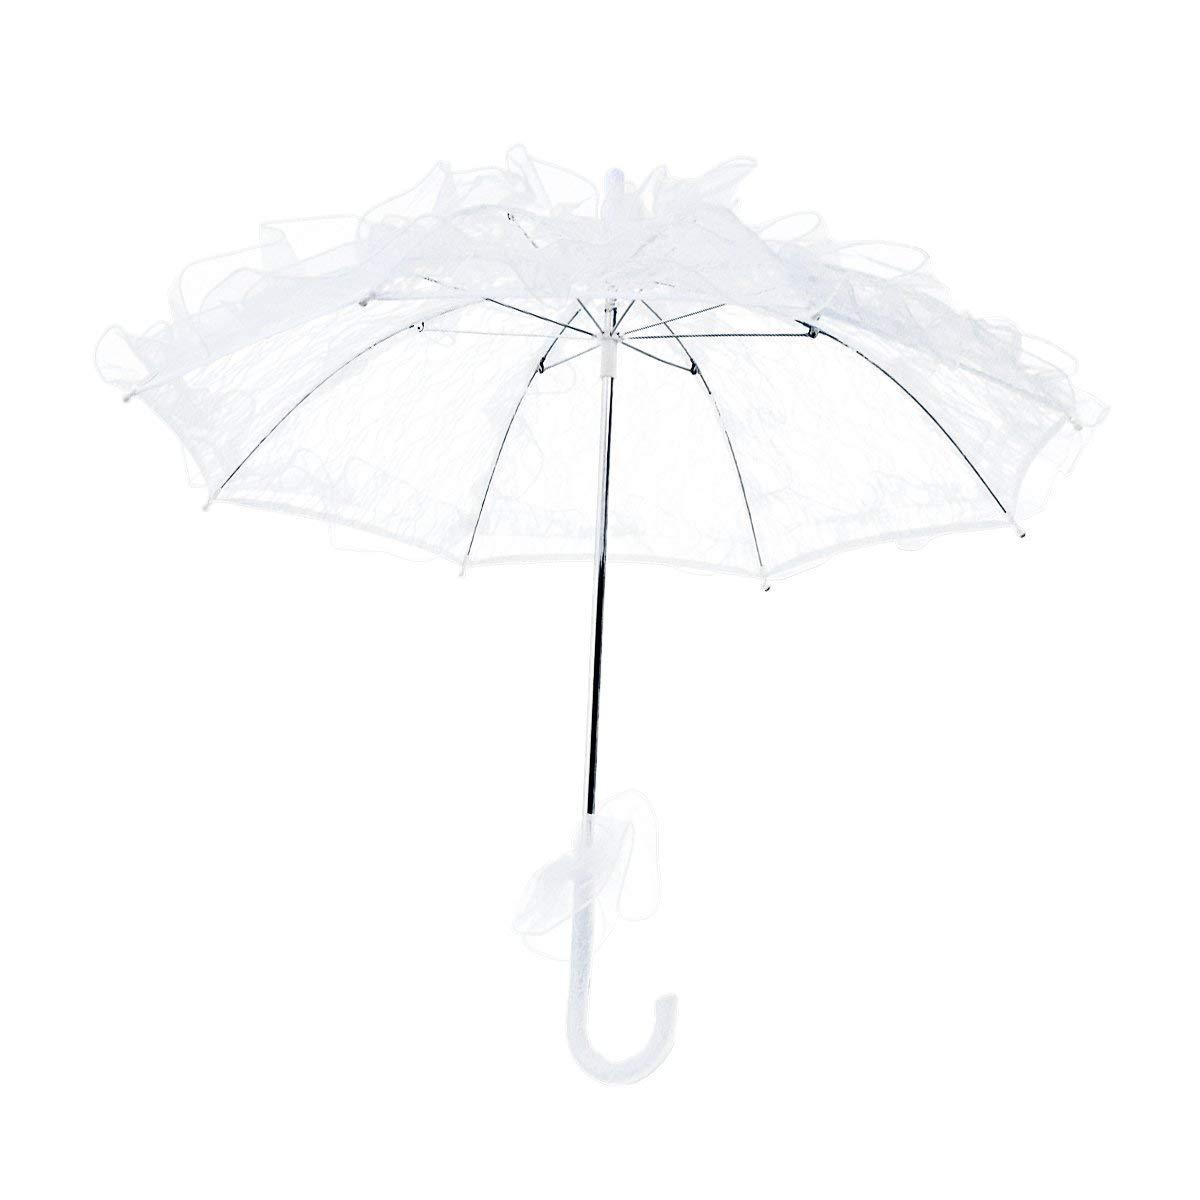 e5728f191ce1 Cheap Wedding Umbrella India, find Wedding Umbrella India deals on ...